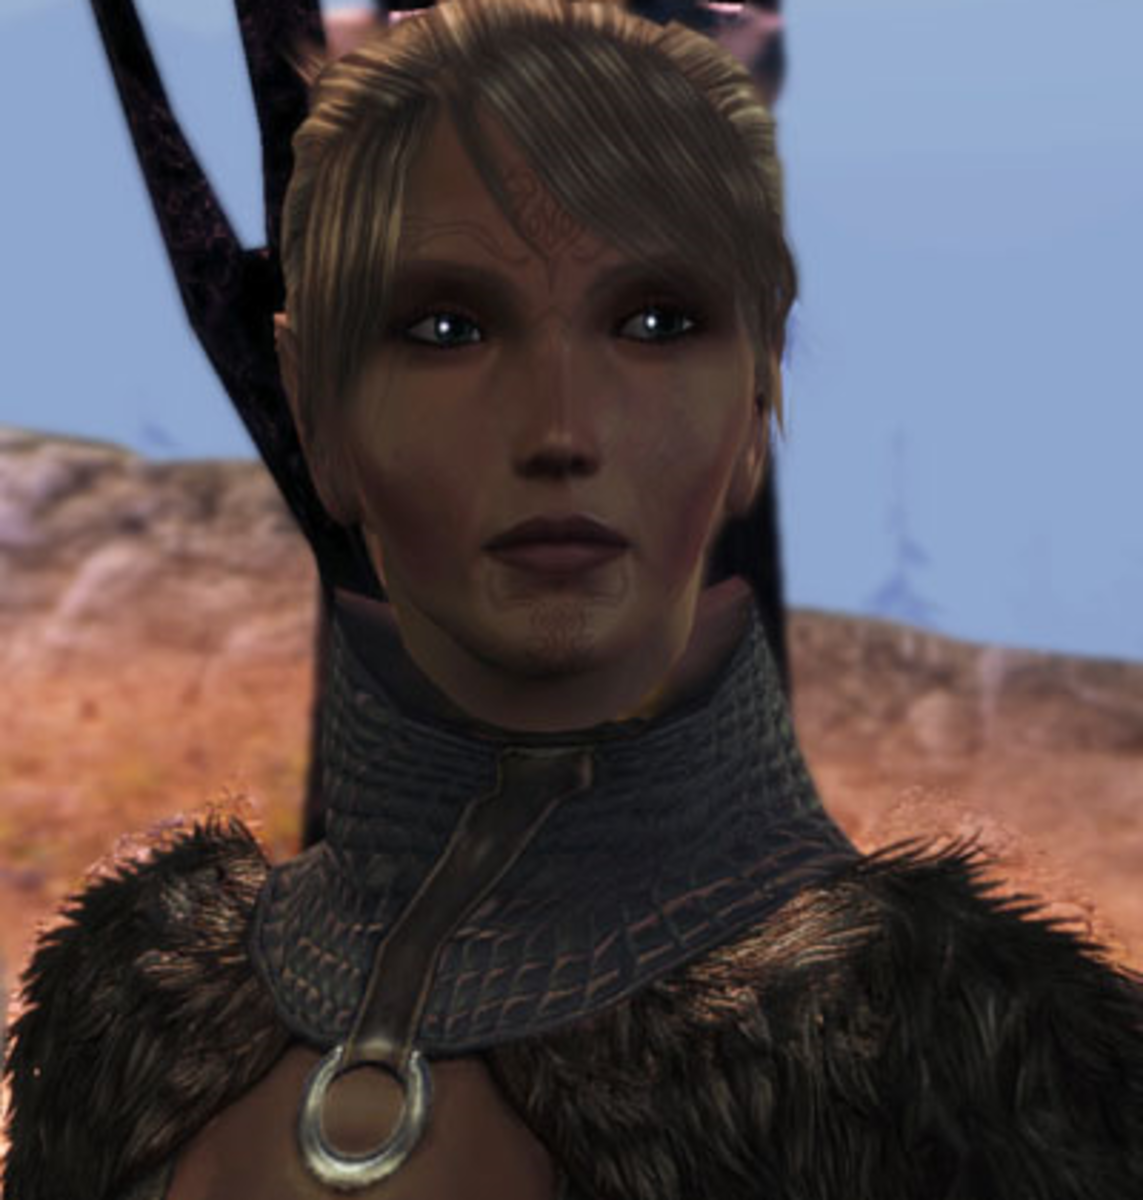 Velanna from Dragon Age Awakening